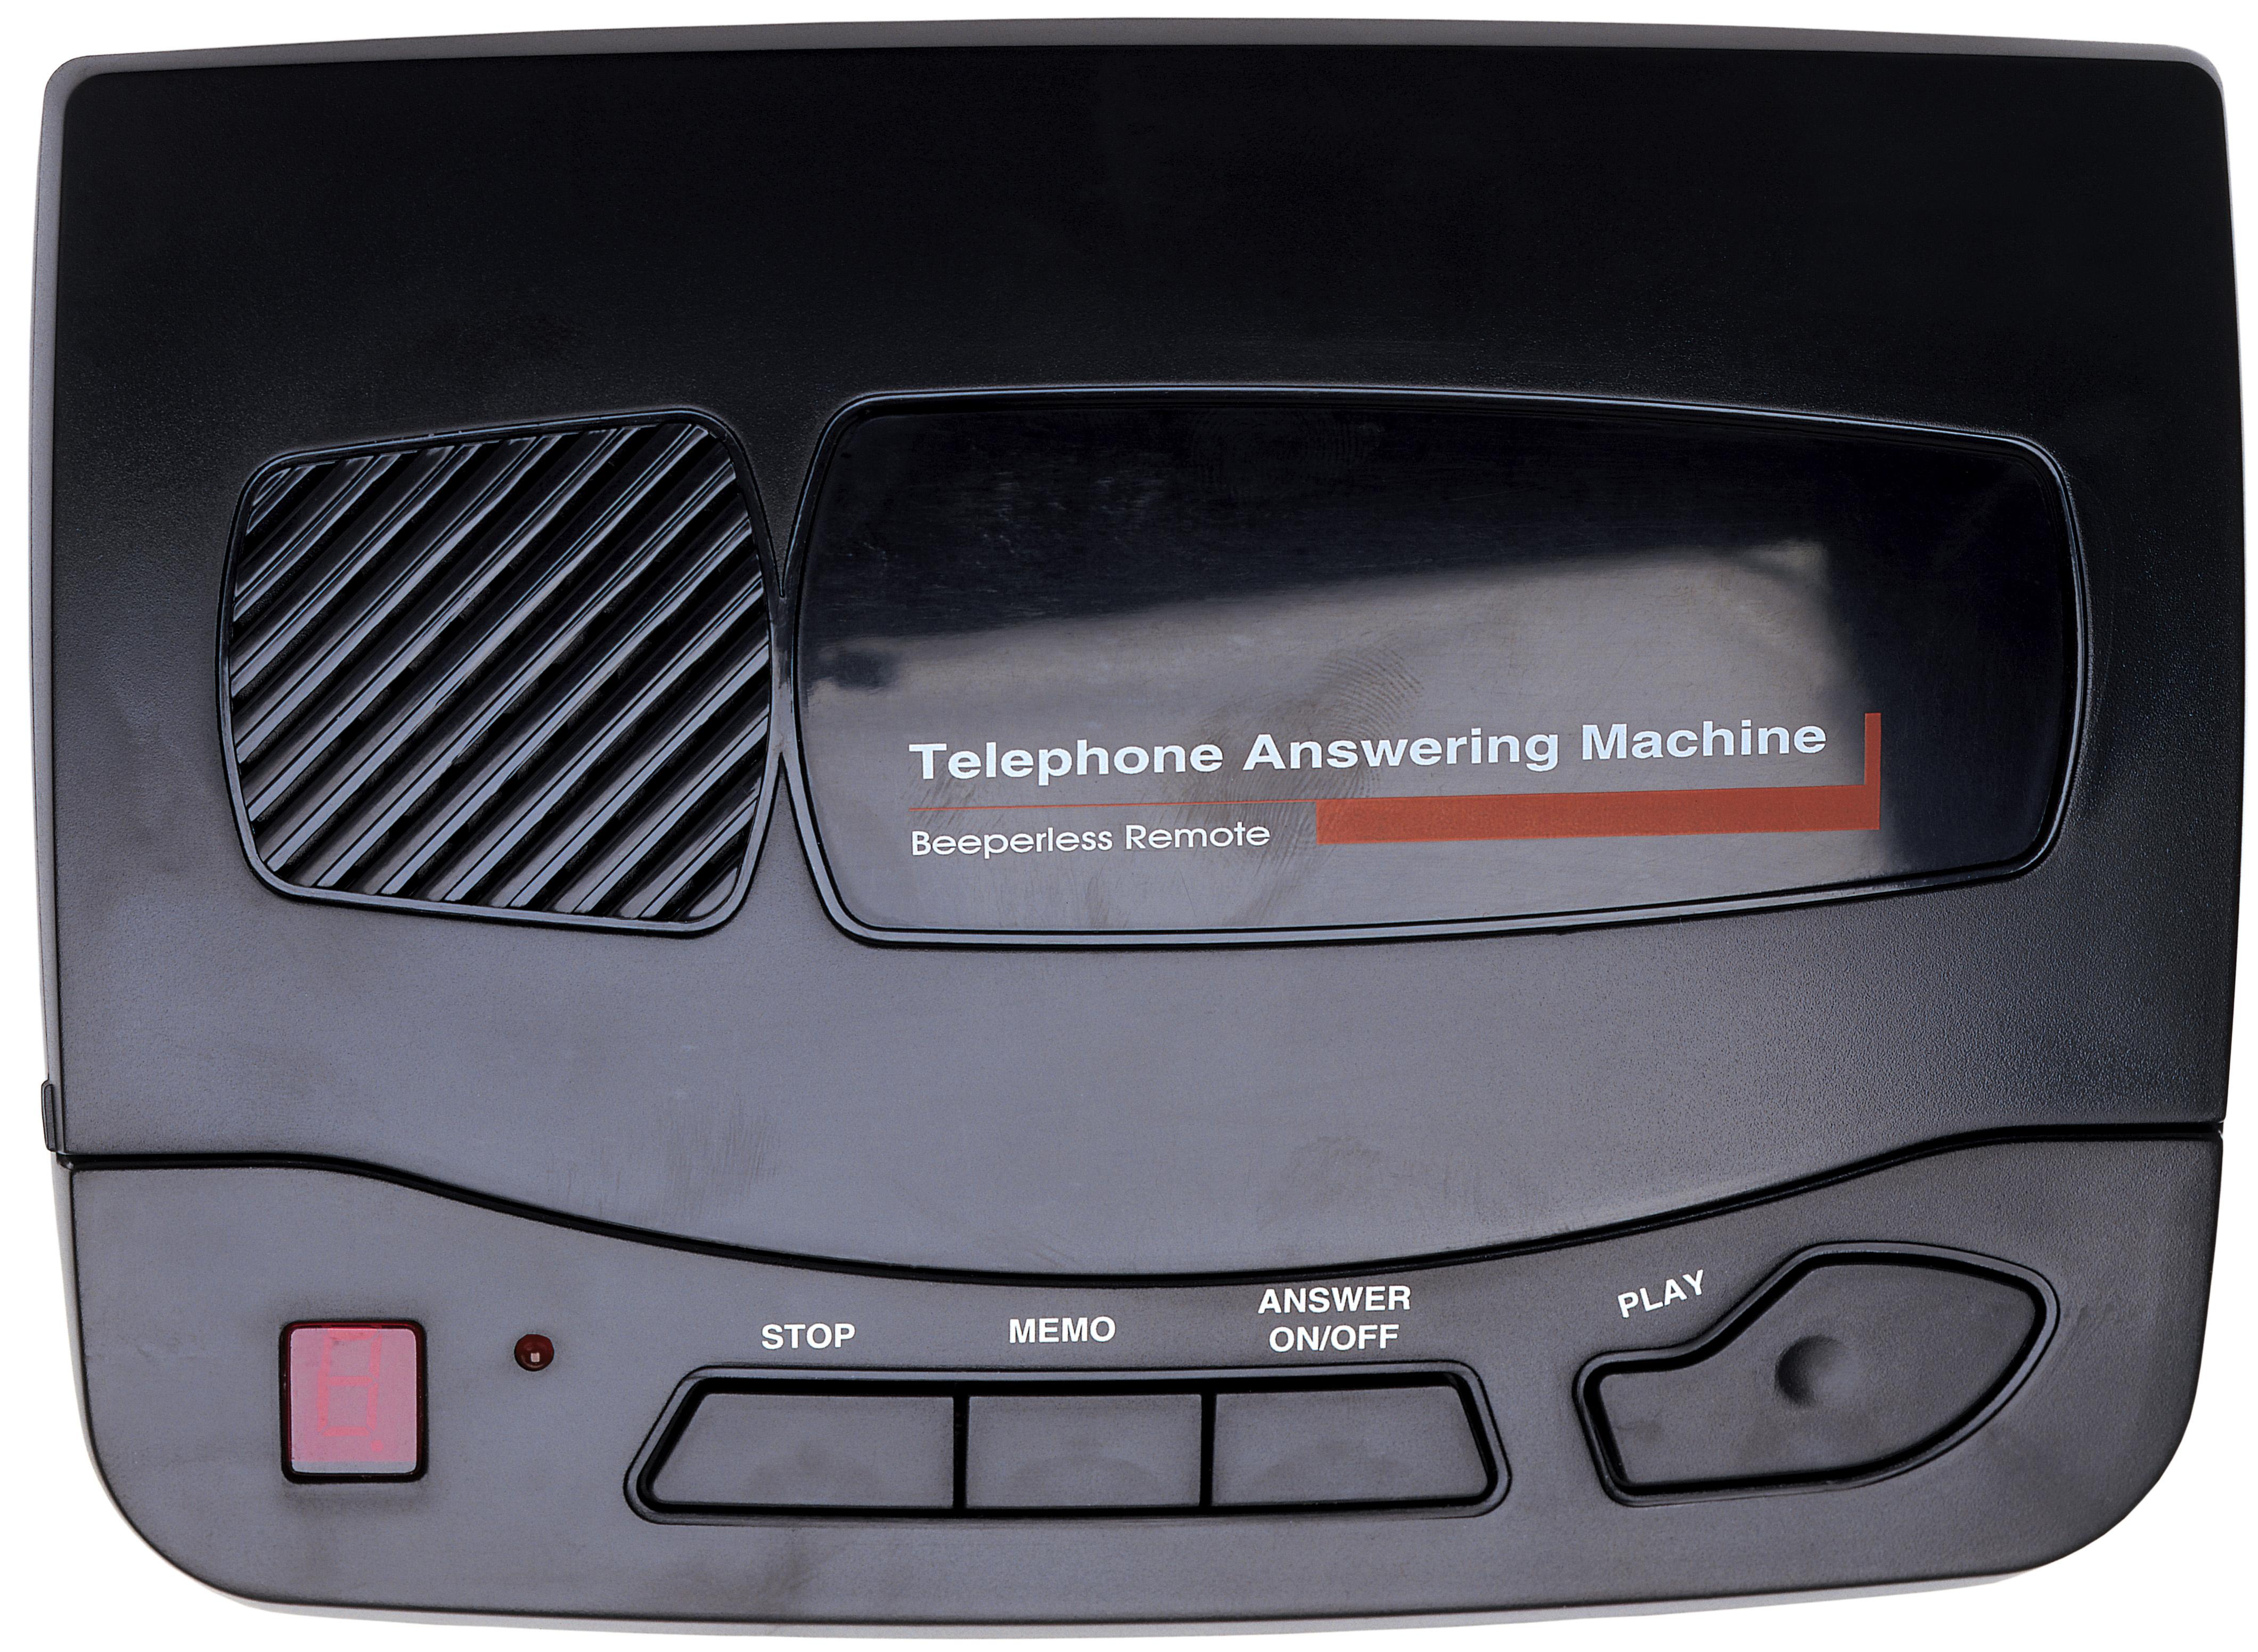 a telephone answering machine